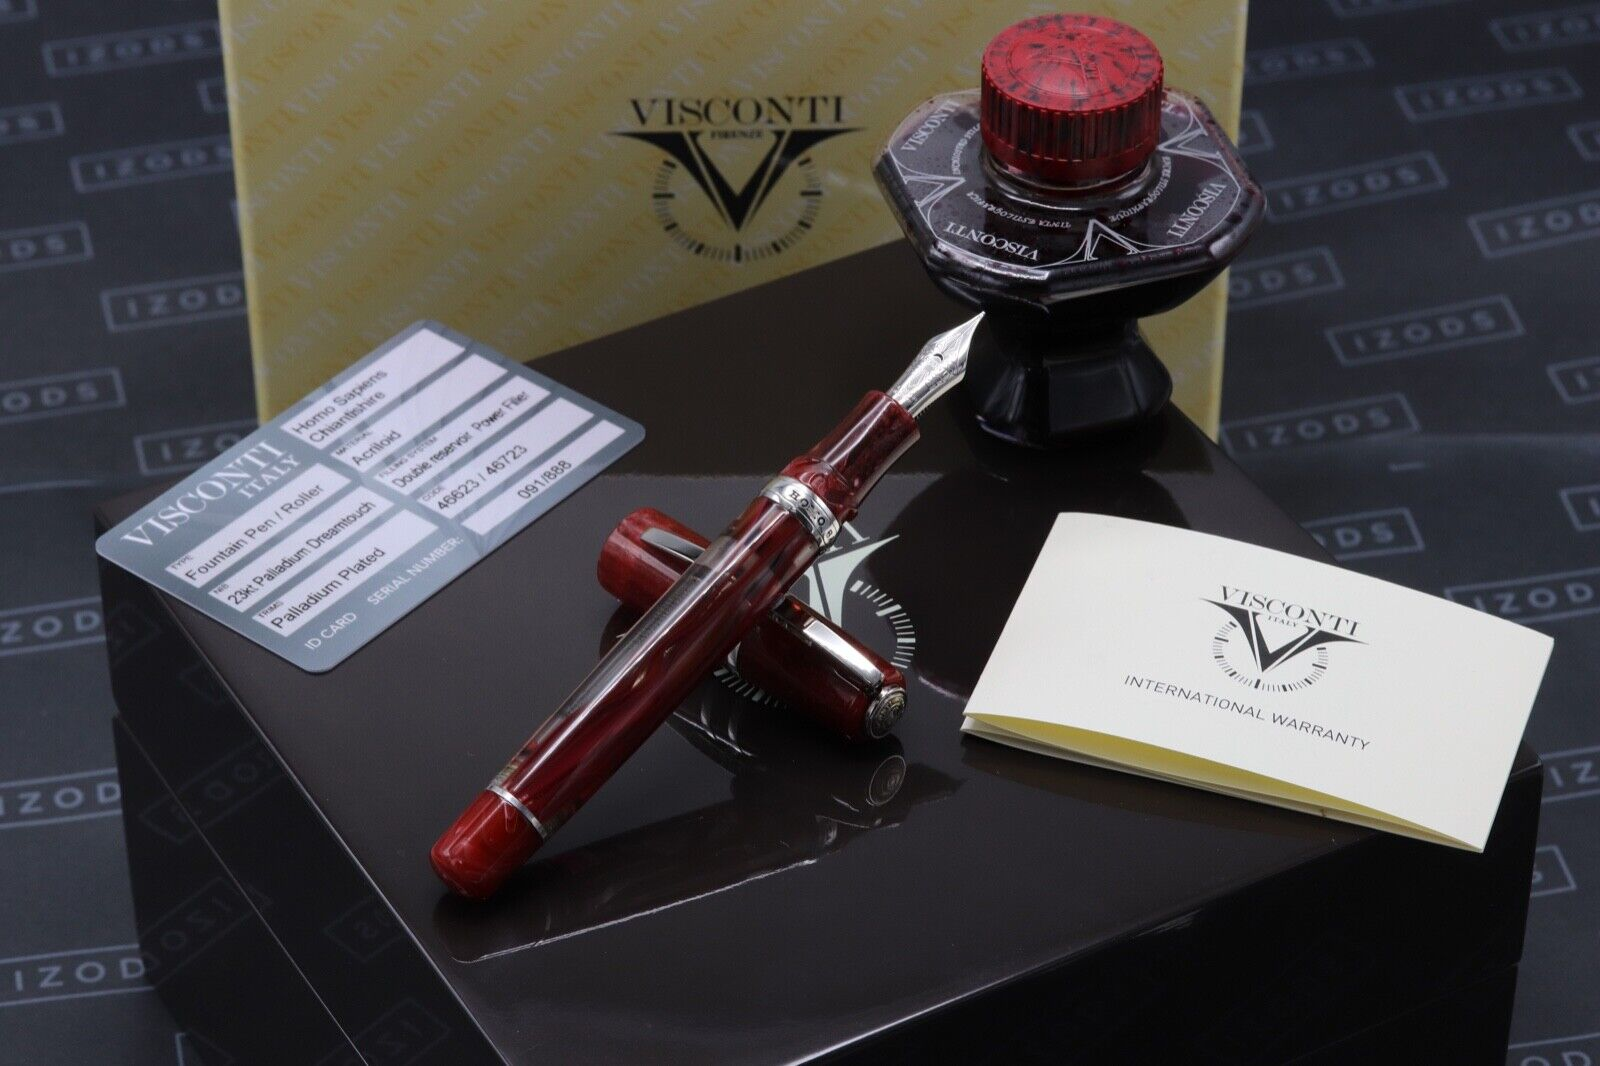 Visconti Homo Sapiens Chiantishire Limited Edition Fountain Pen